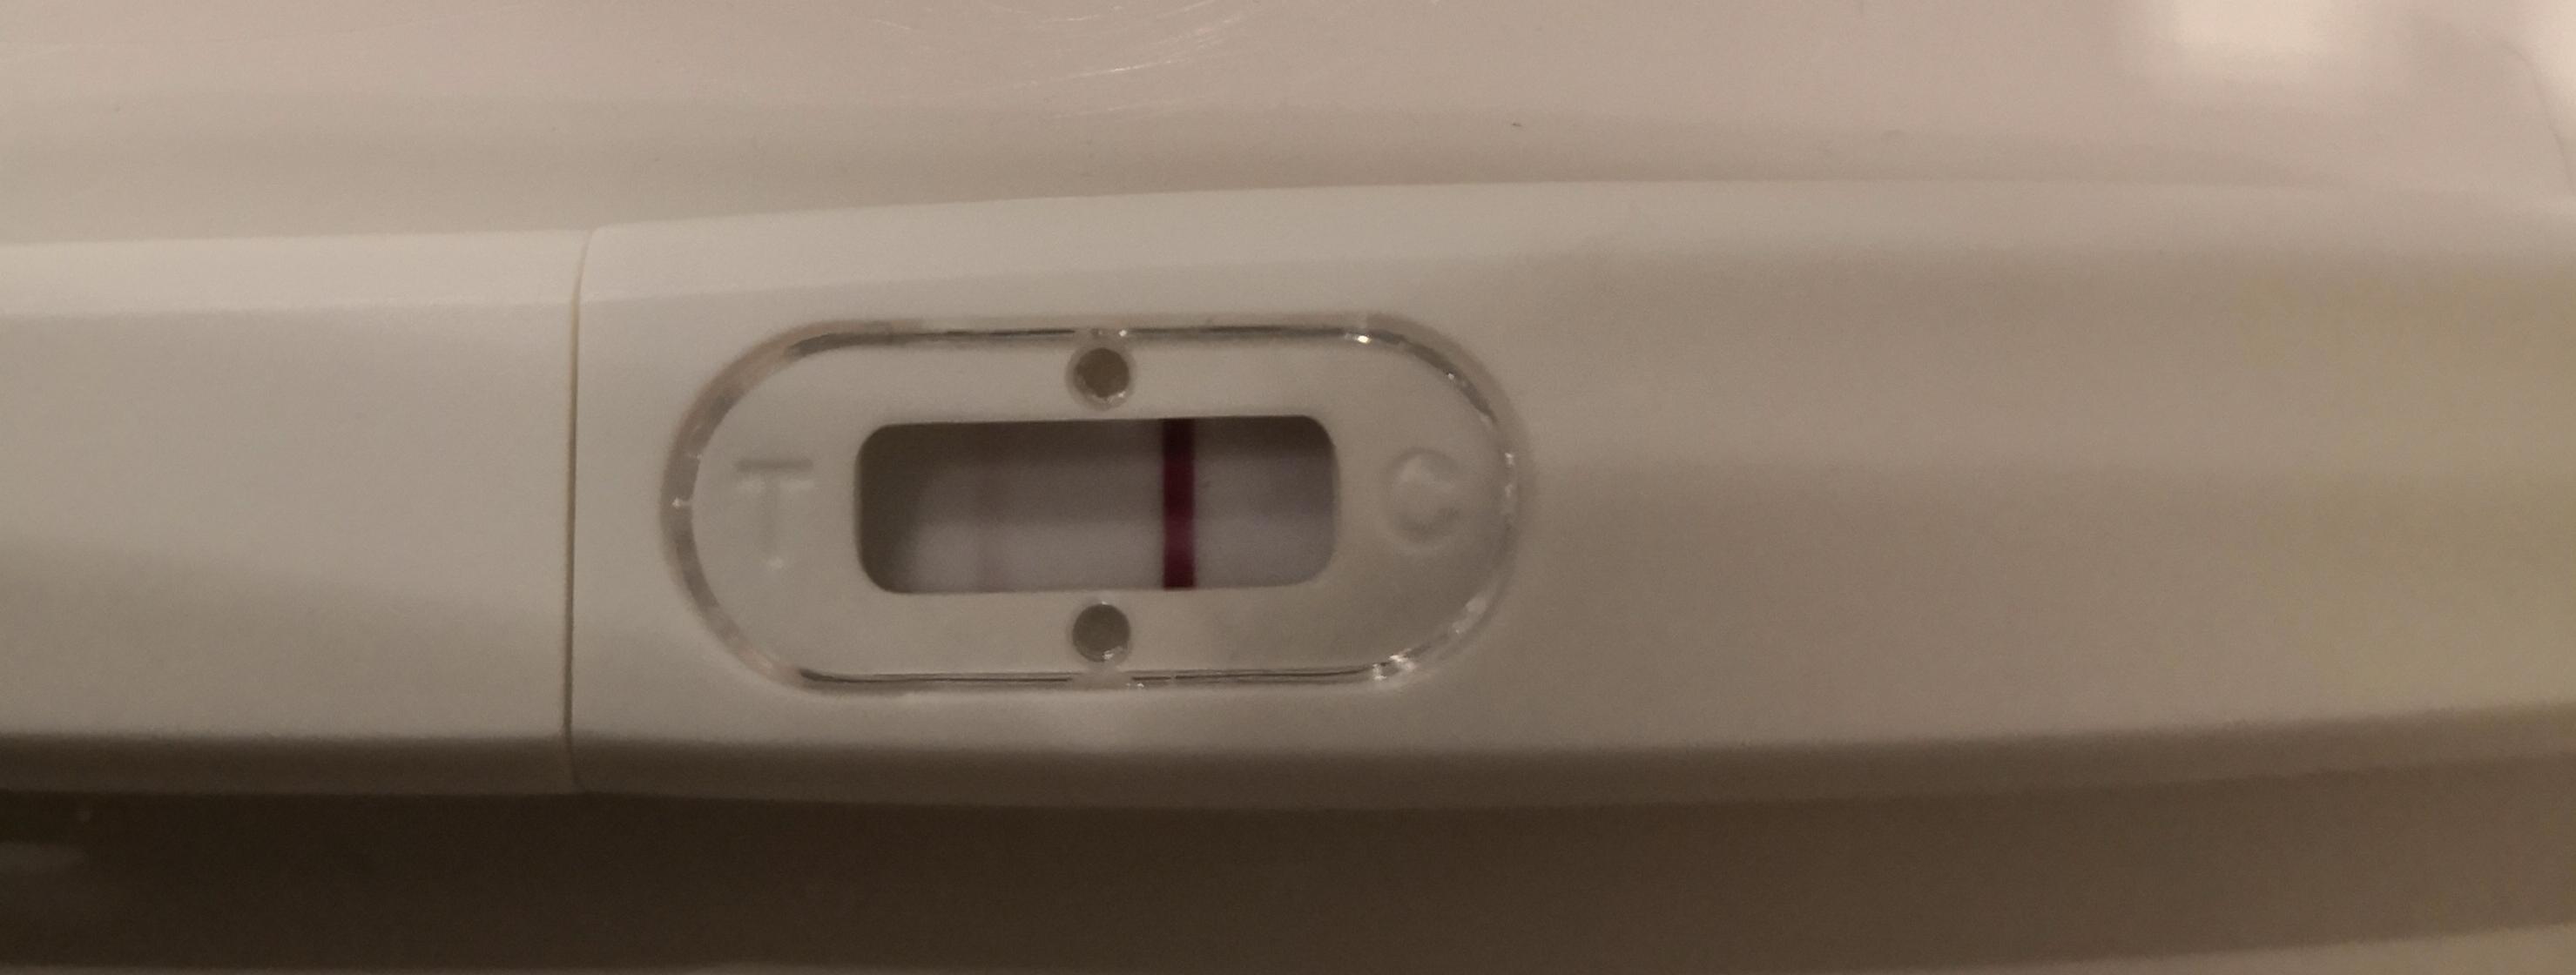 Positiv graviditetstest